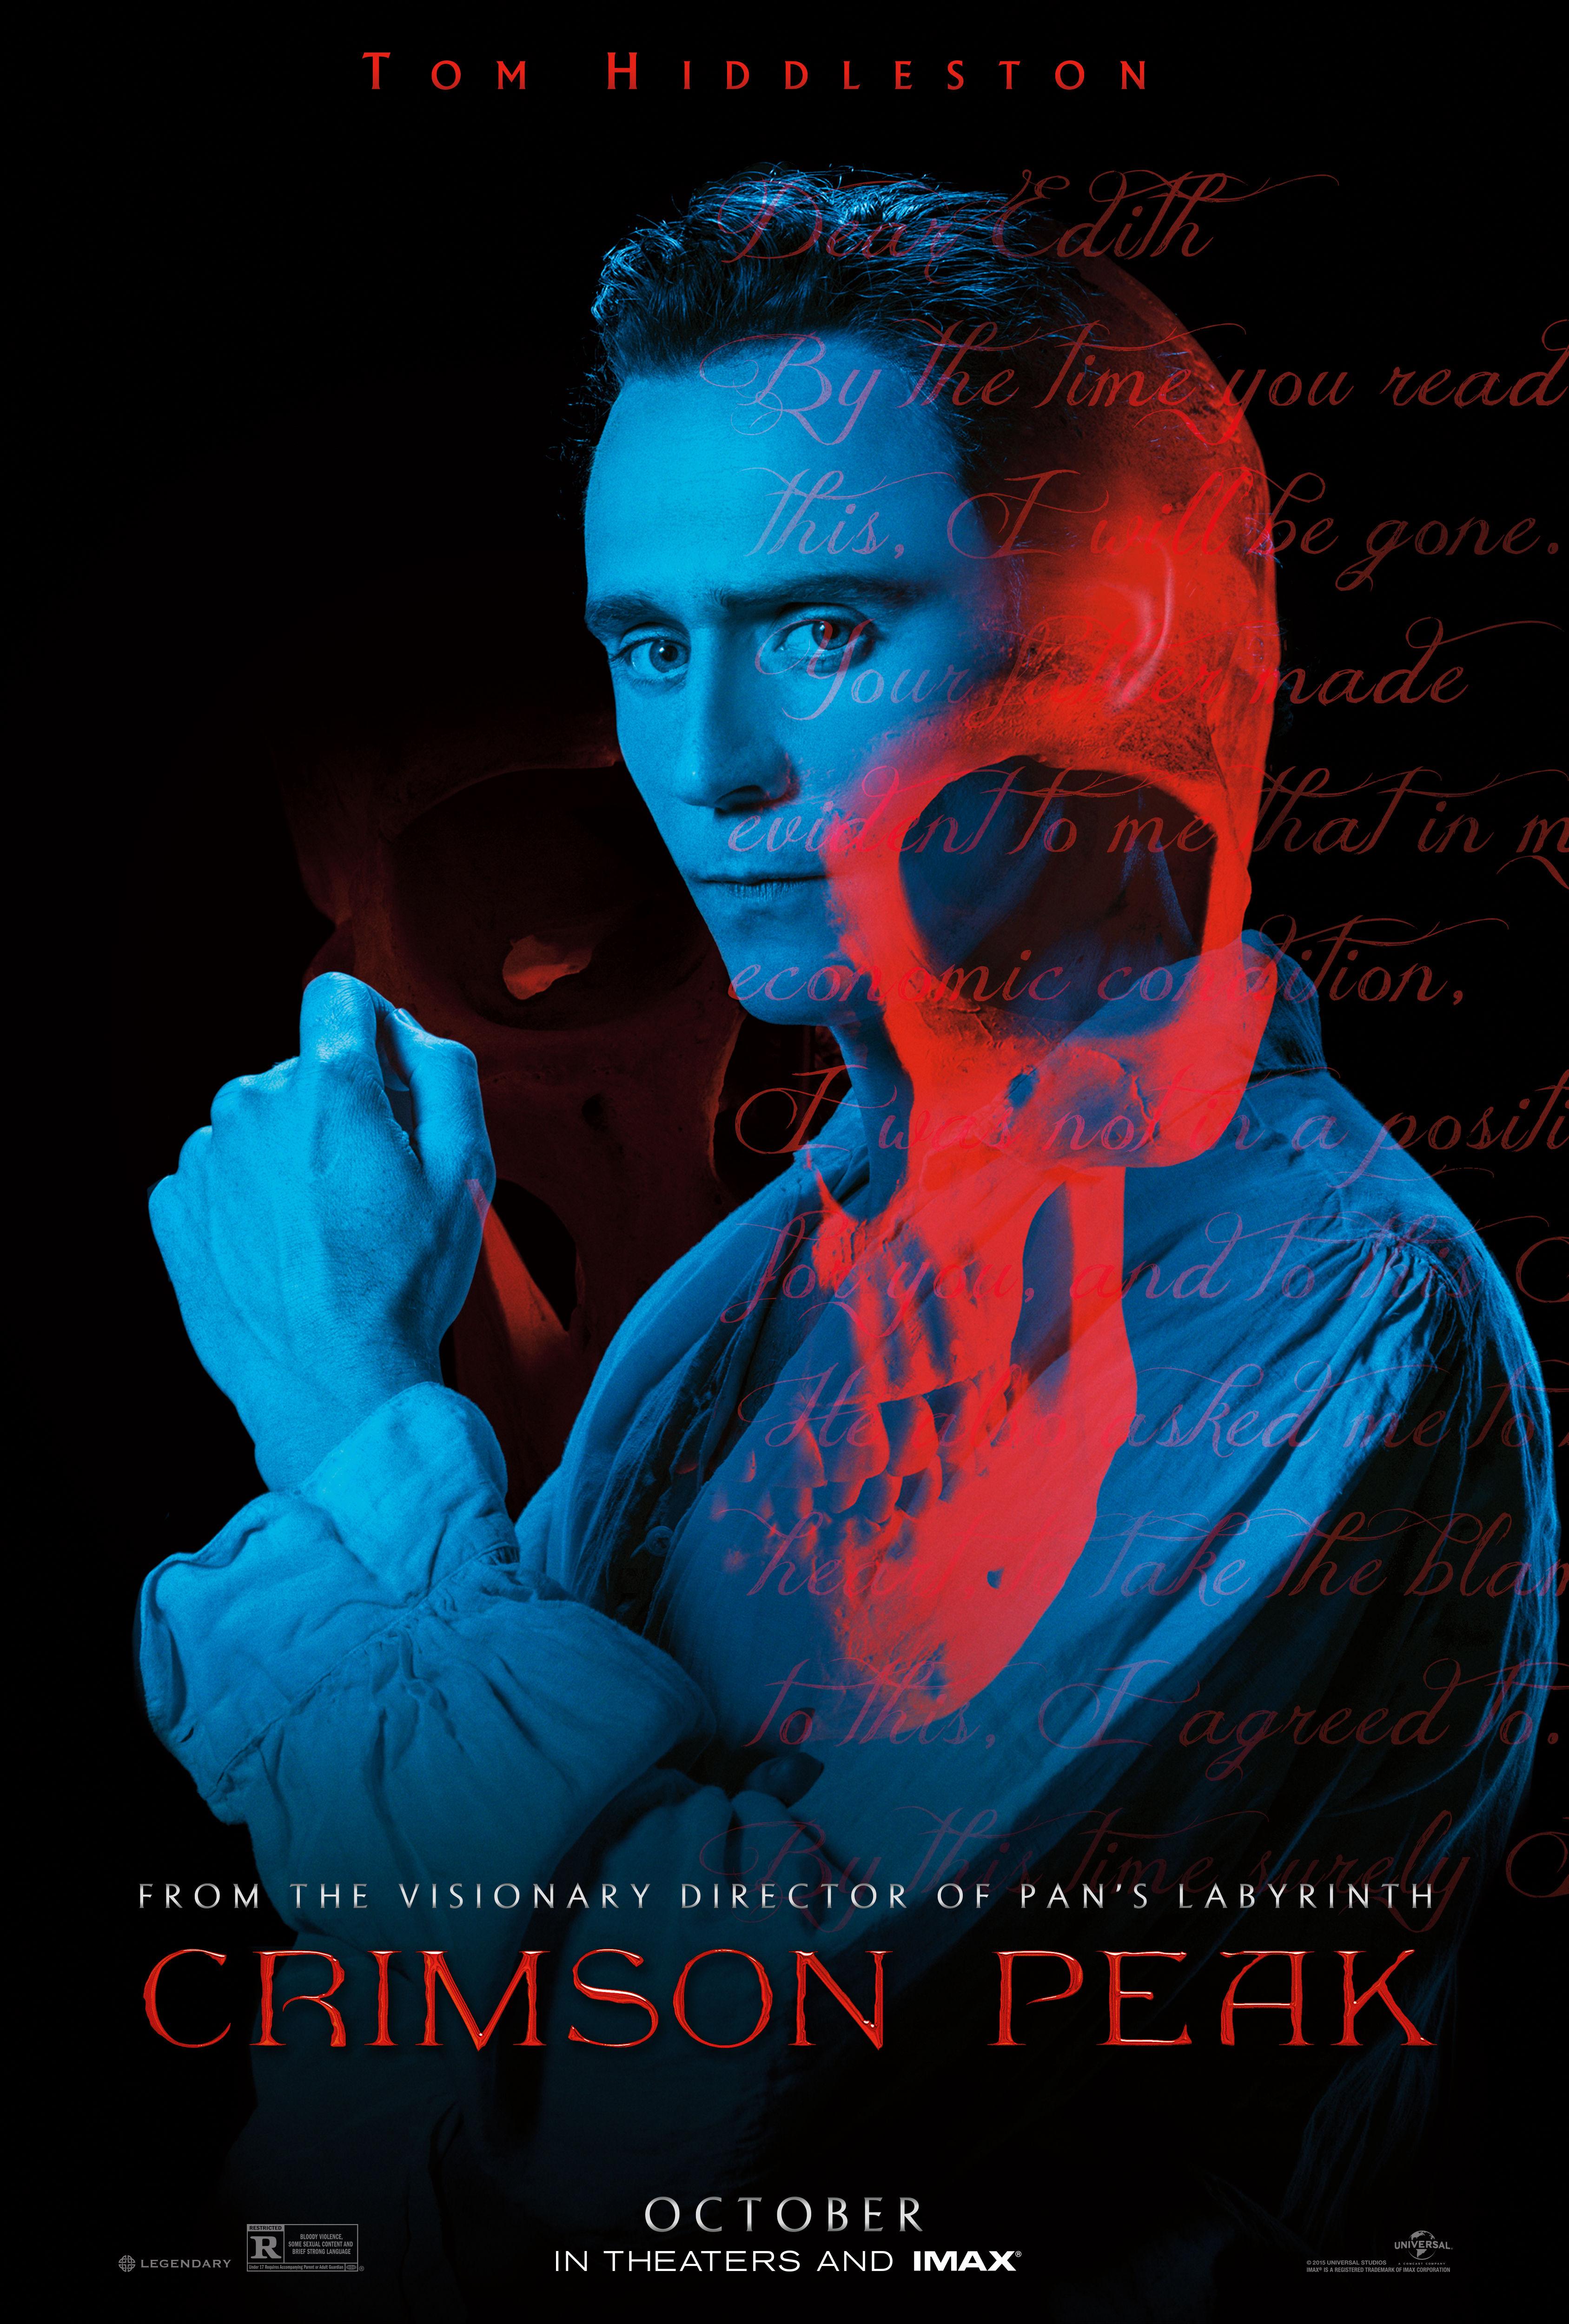 Crimson-Peak-Tom-Hiddleston-poster